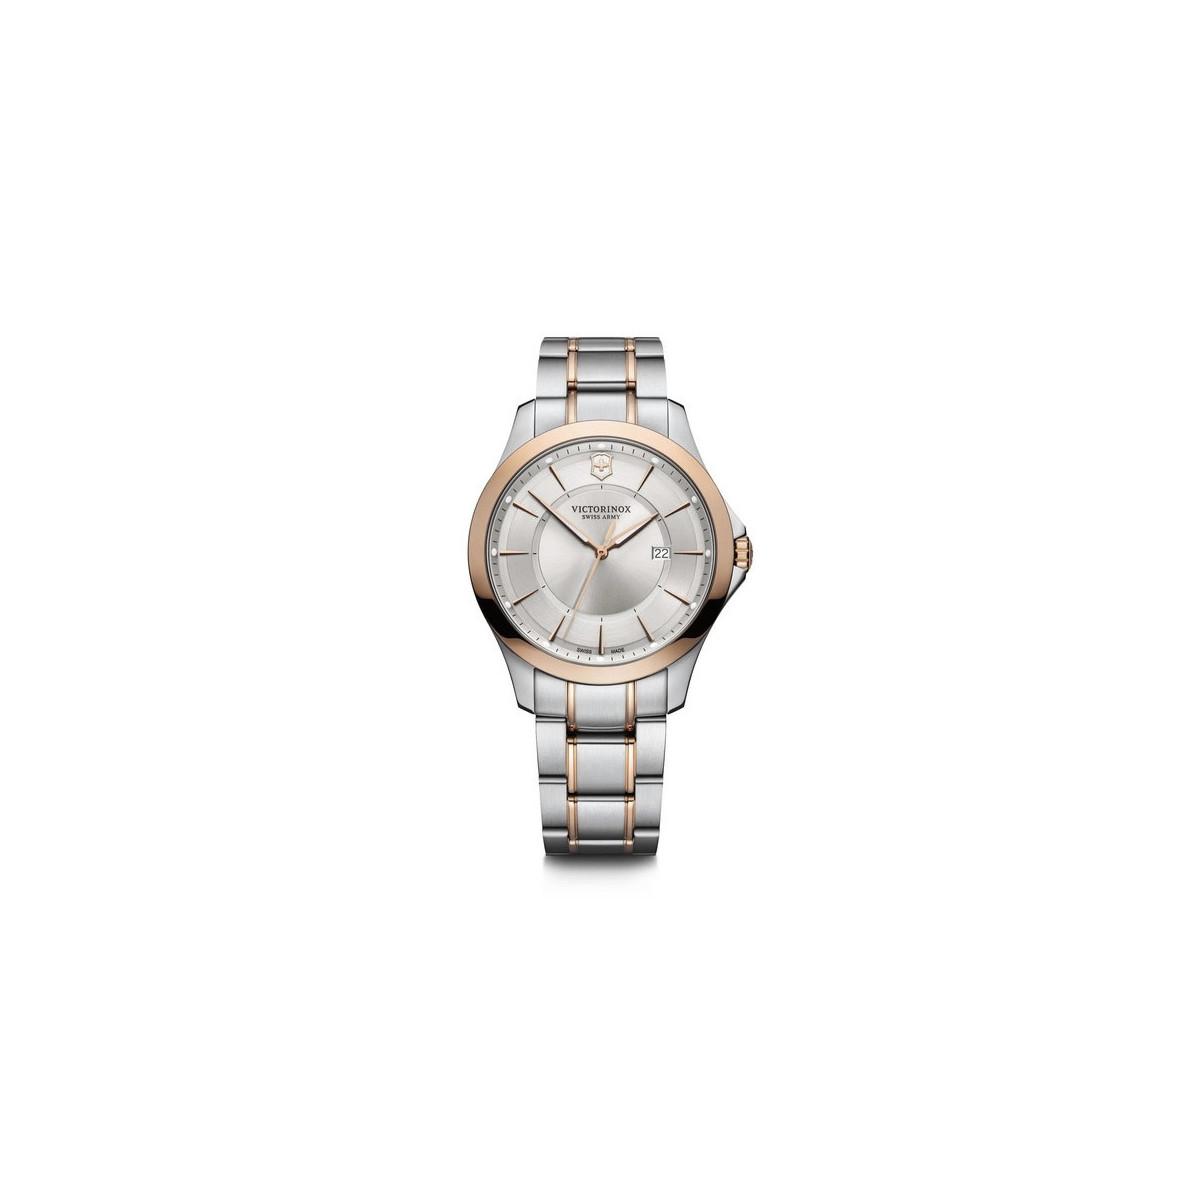 Reloj Victorinox Alliance 241912